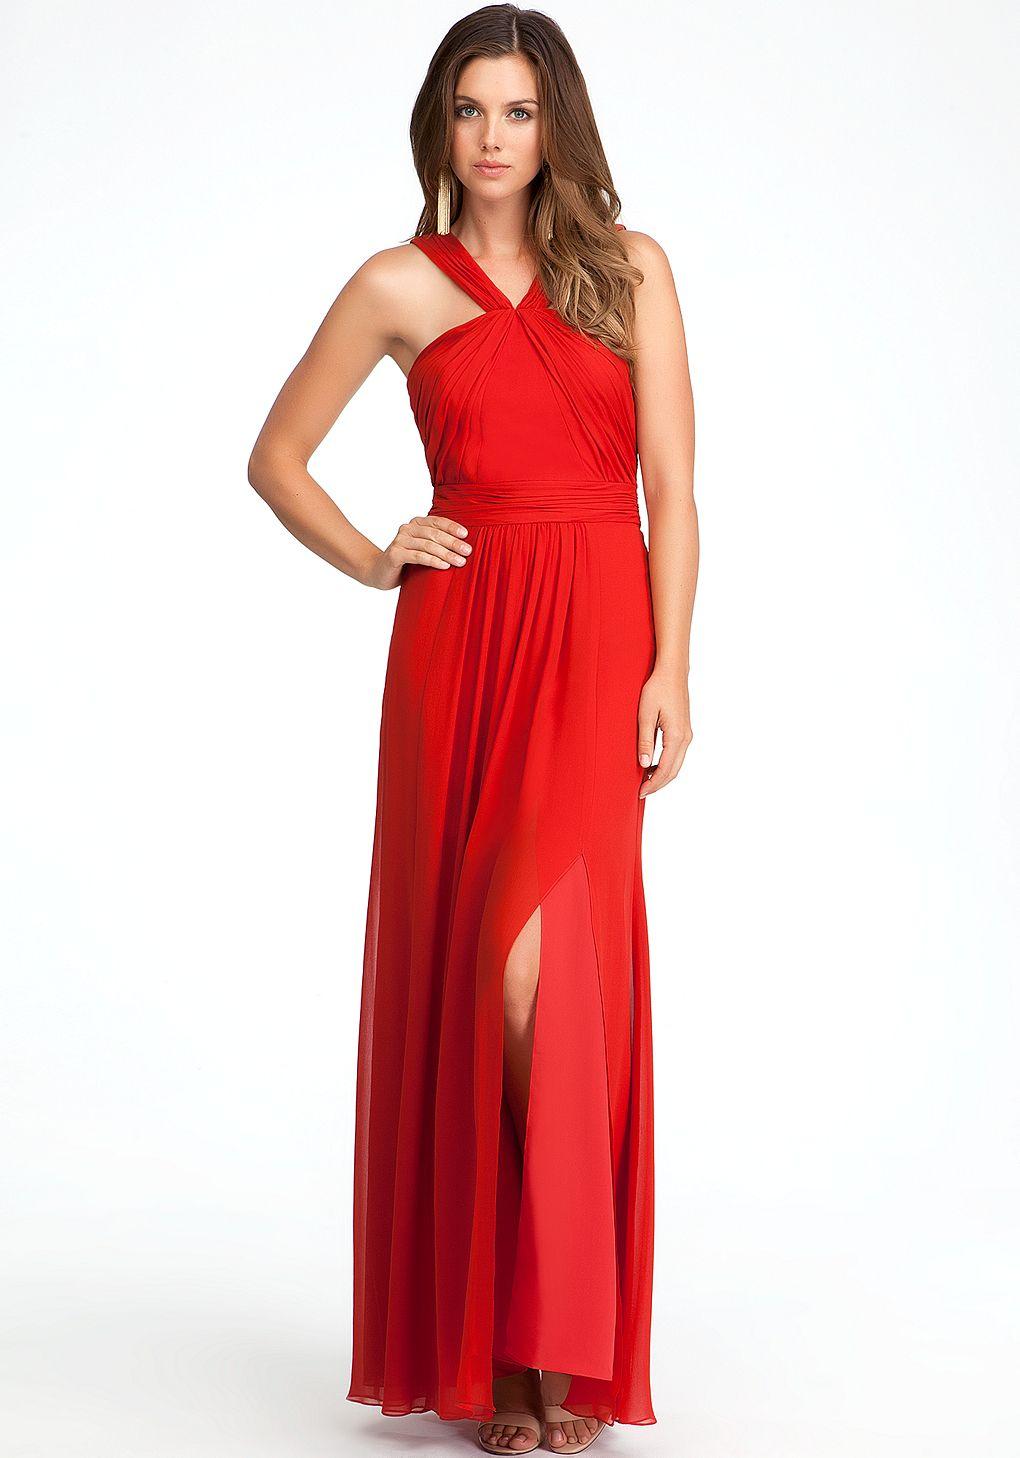 Bebe jennifer cross strap gown dresses evening fashion